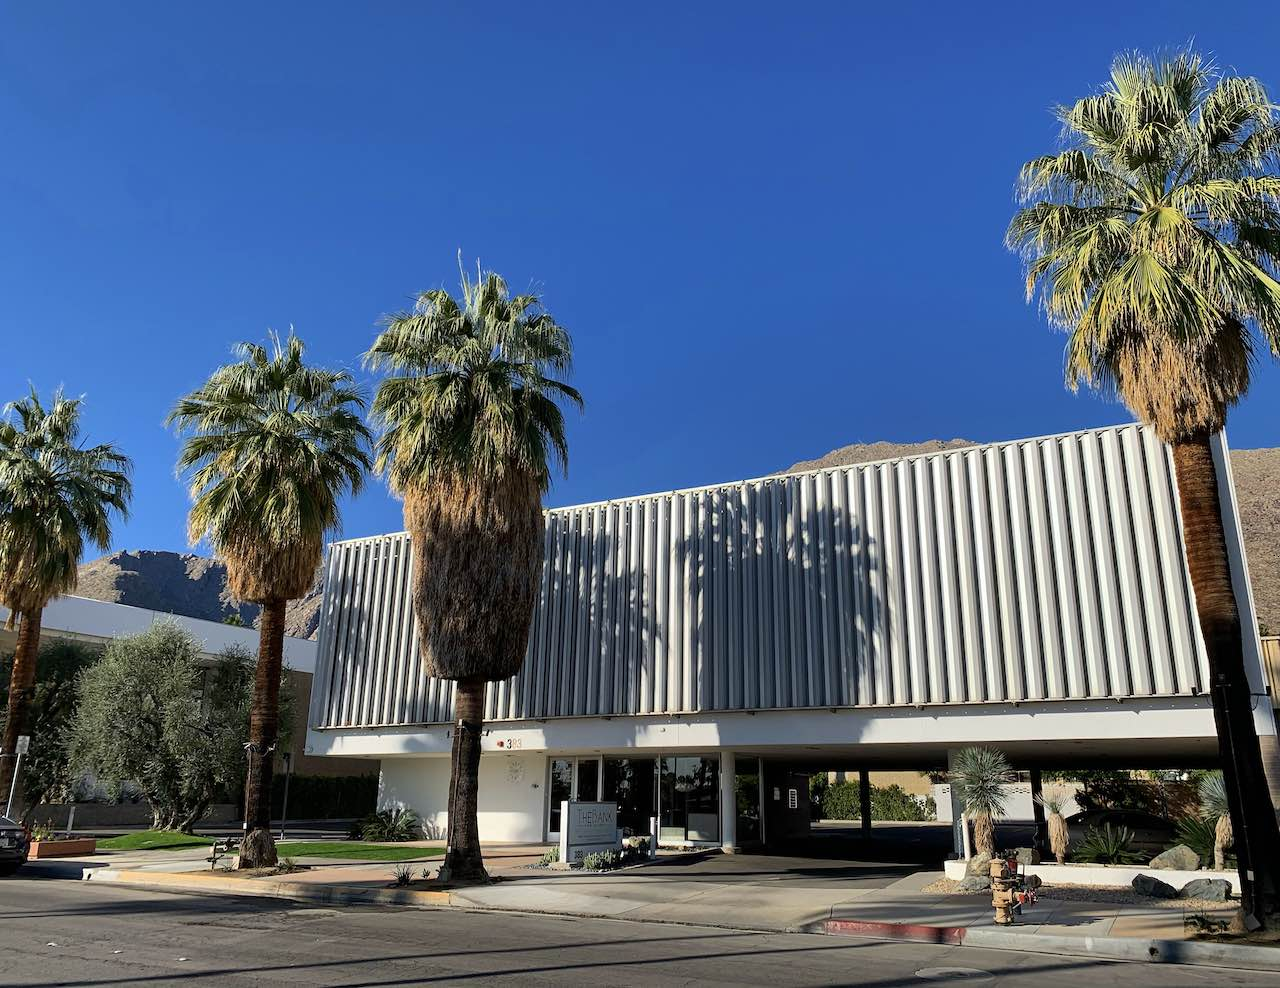 Palm Springs Modernism Buildings